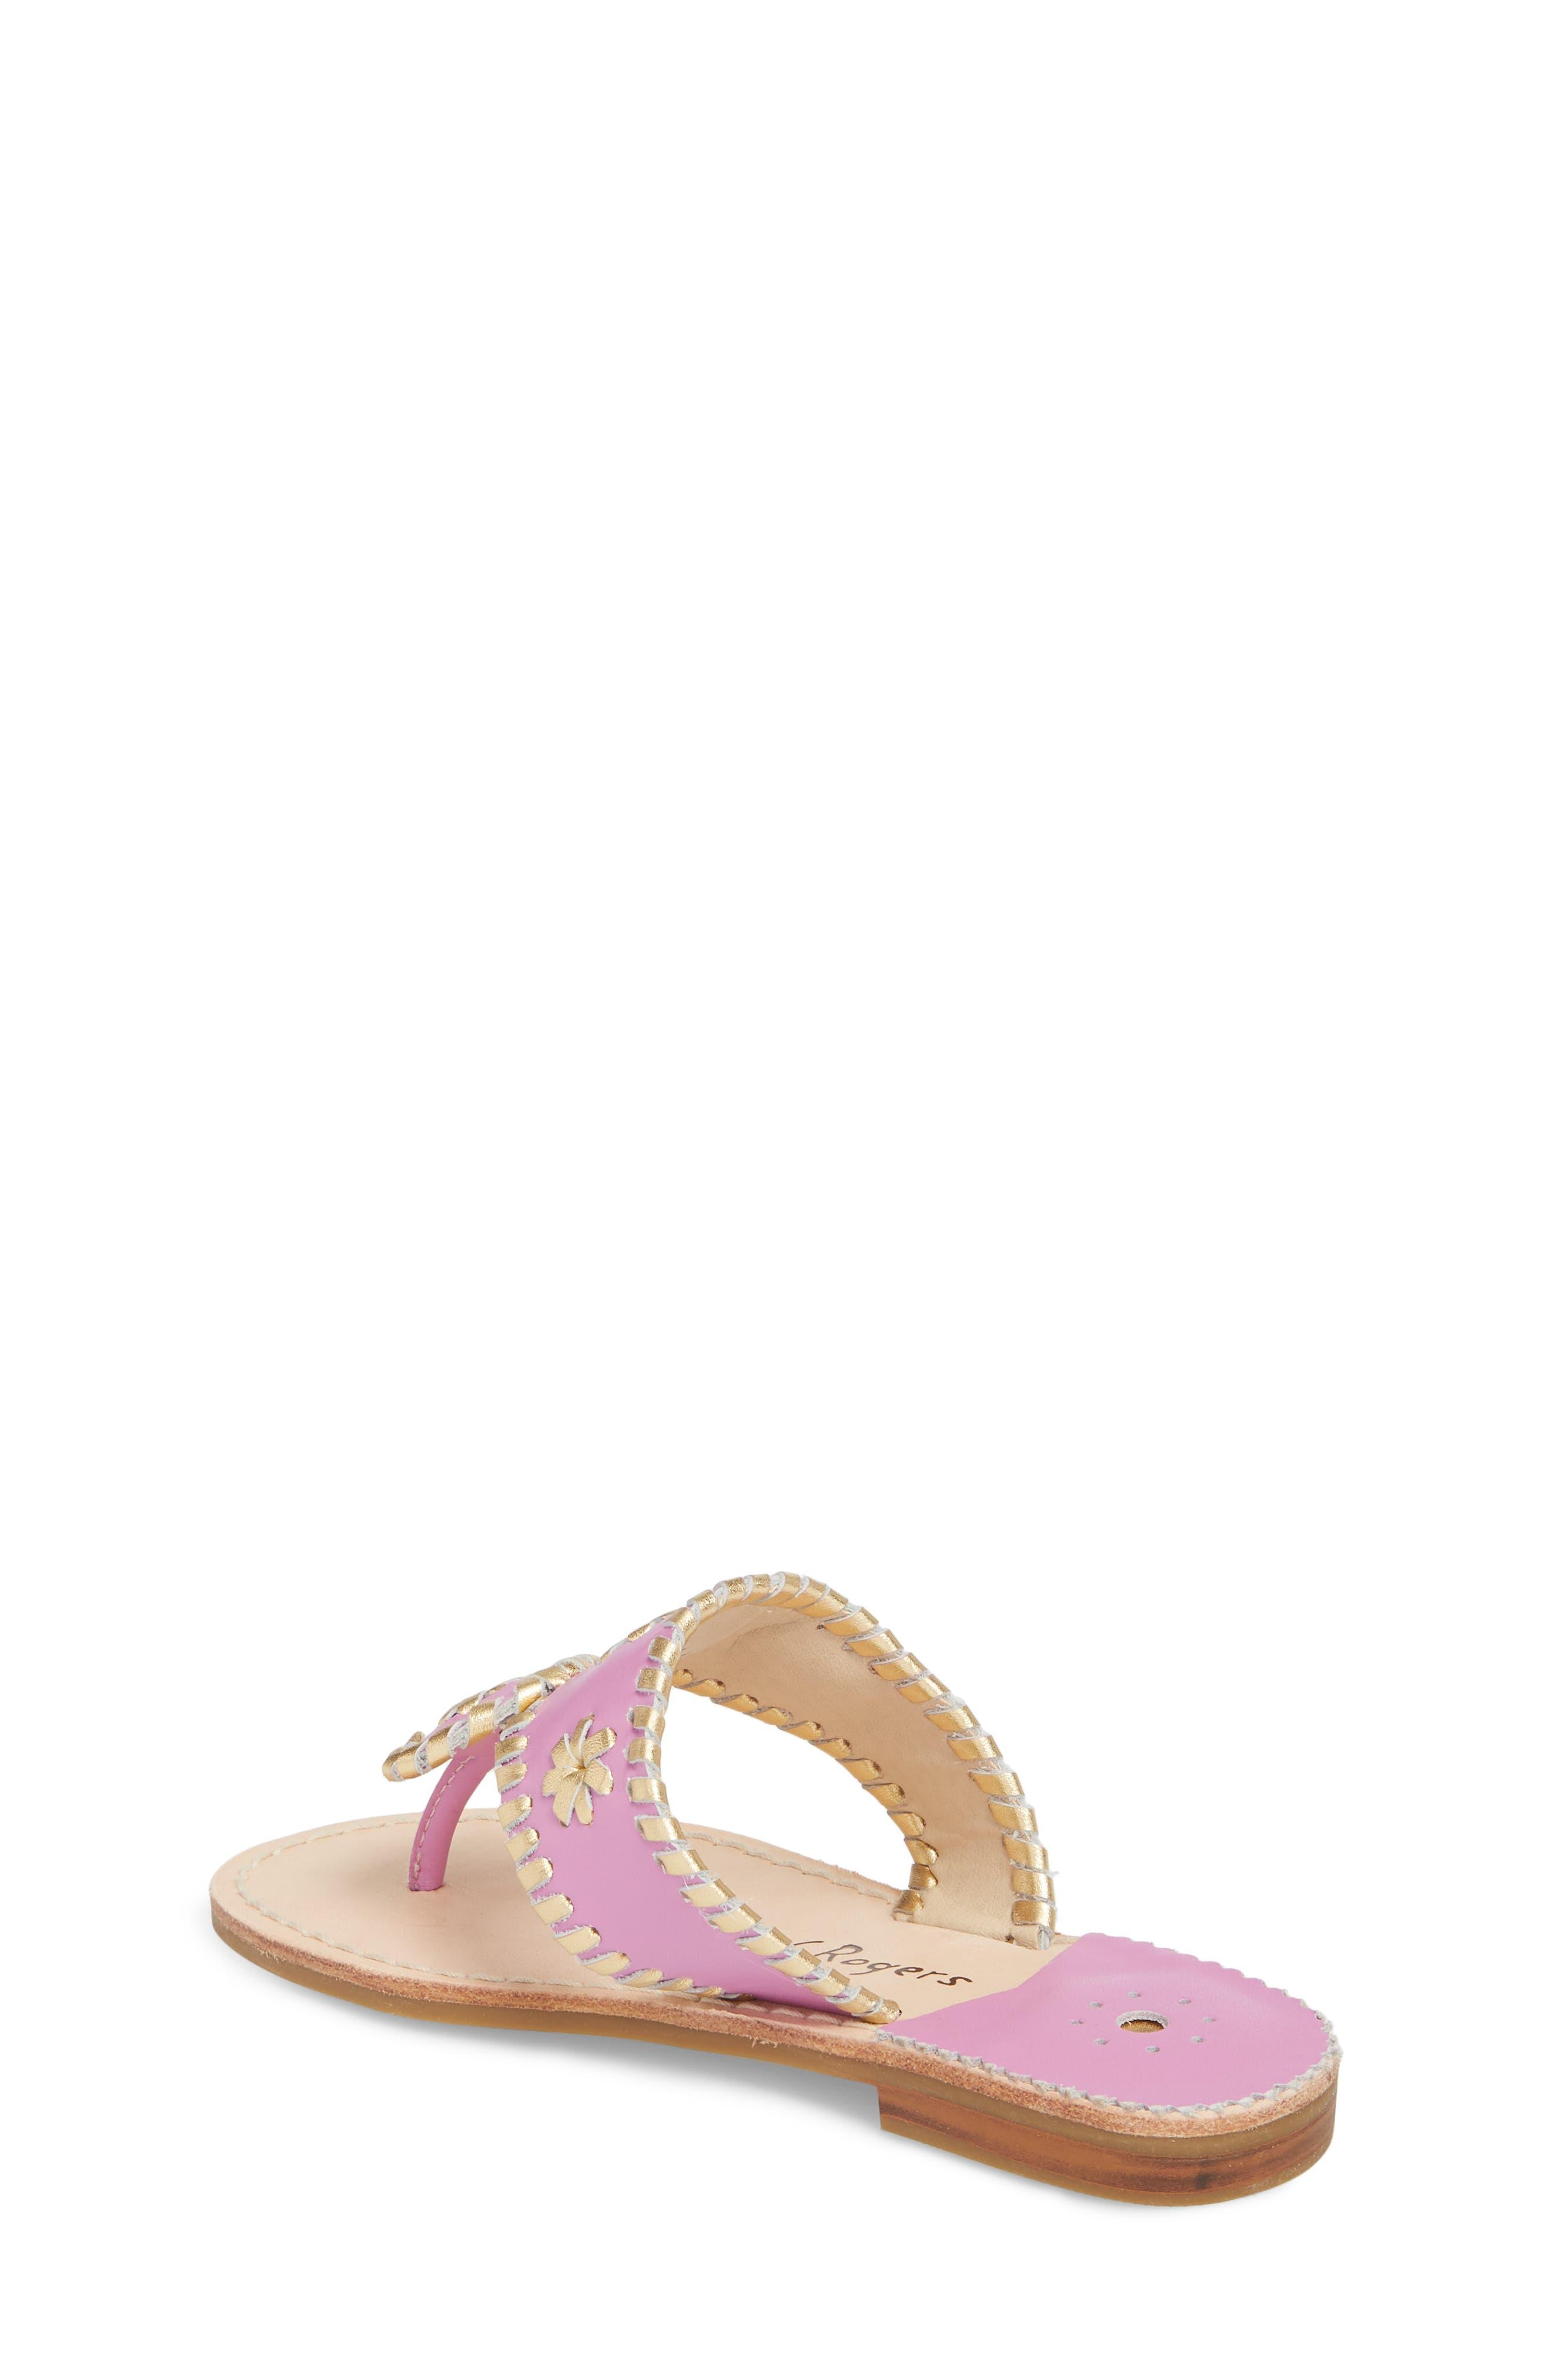 Miss Hollis Metallic Trim Thong Sandal,                             Alternate thumbnail 2, color,                             Lavender Pink/ Gold Leather